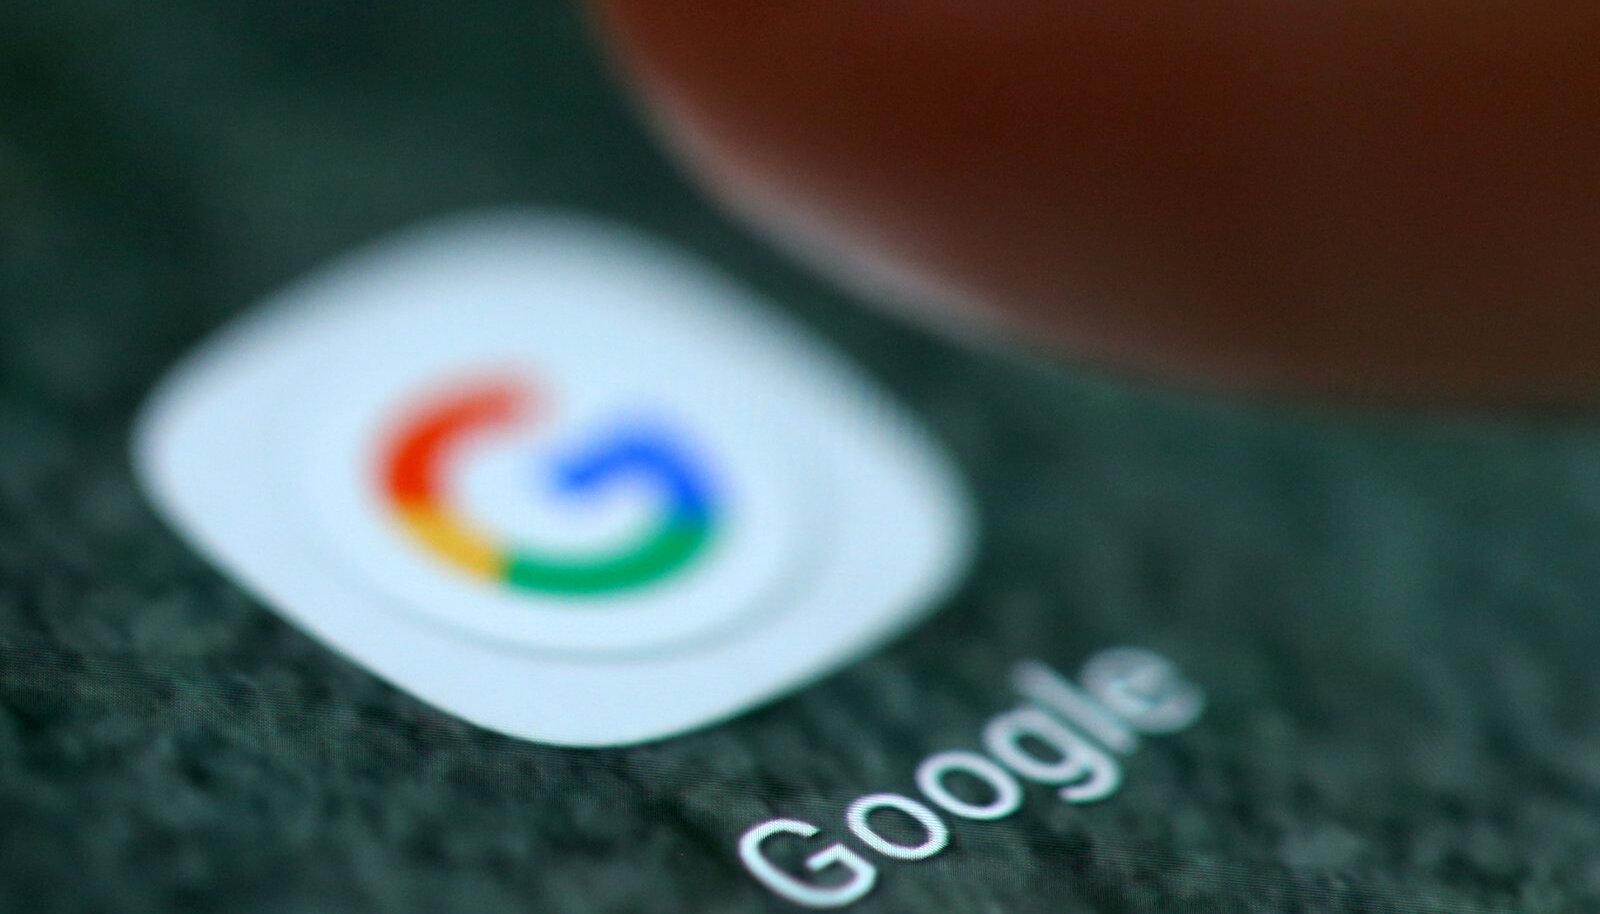 Google'i logo